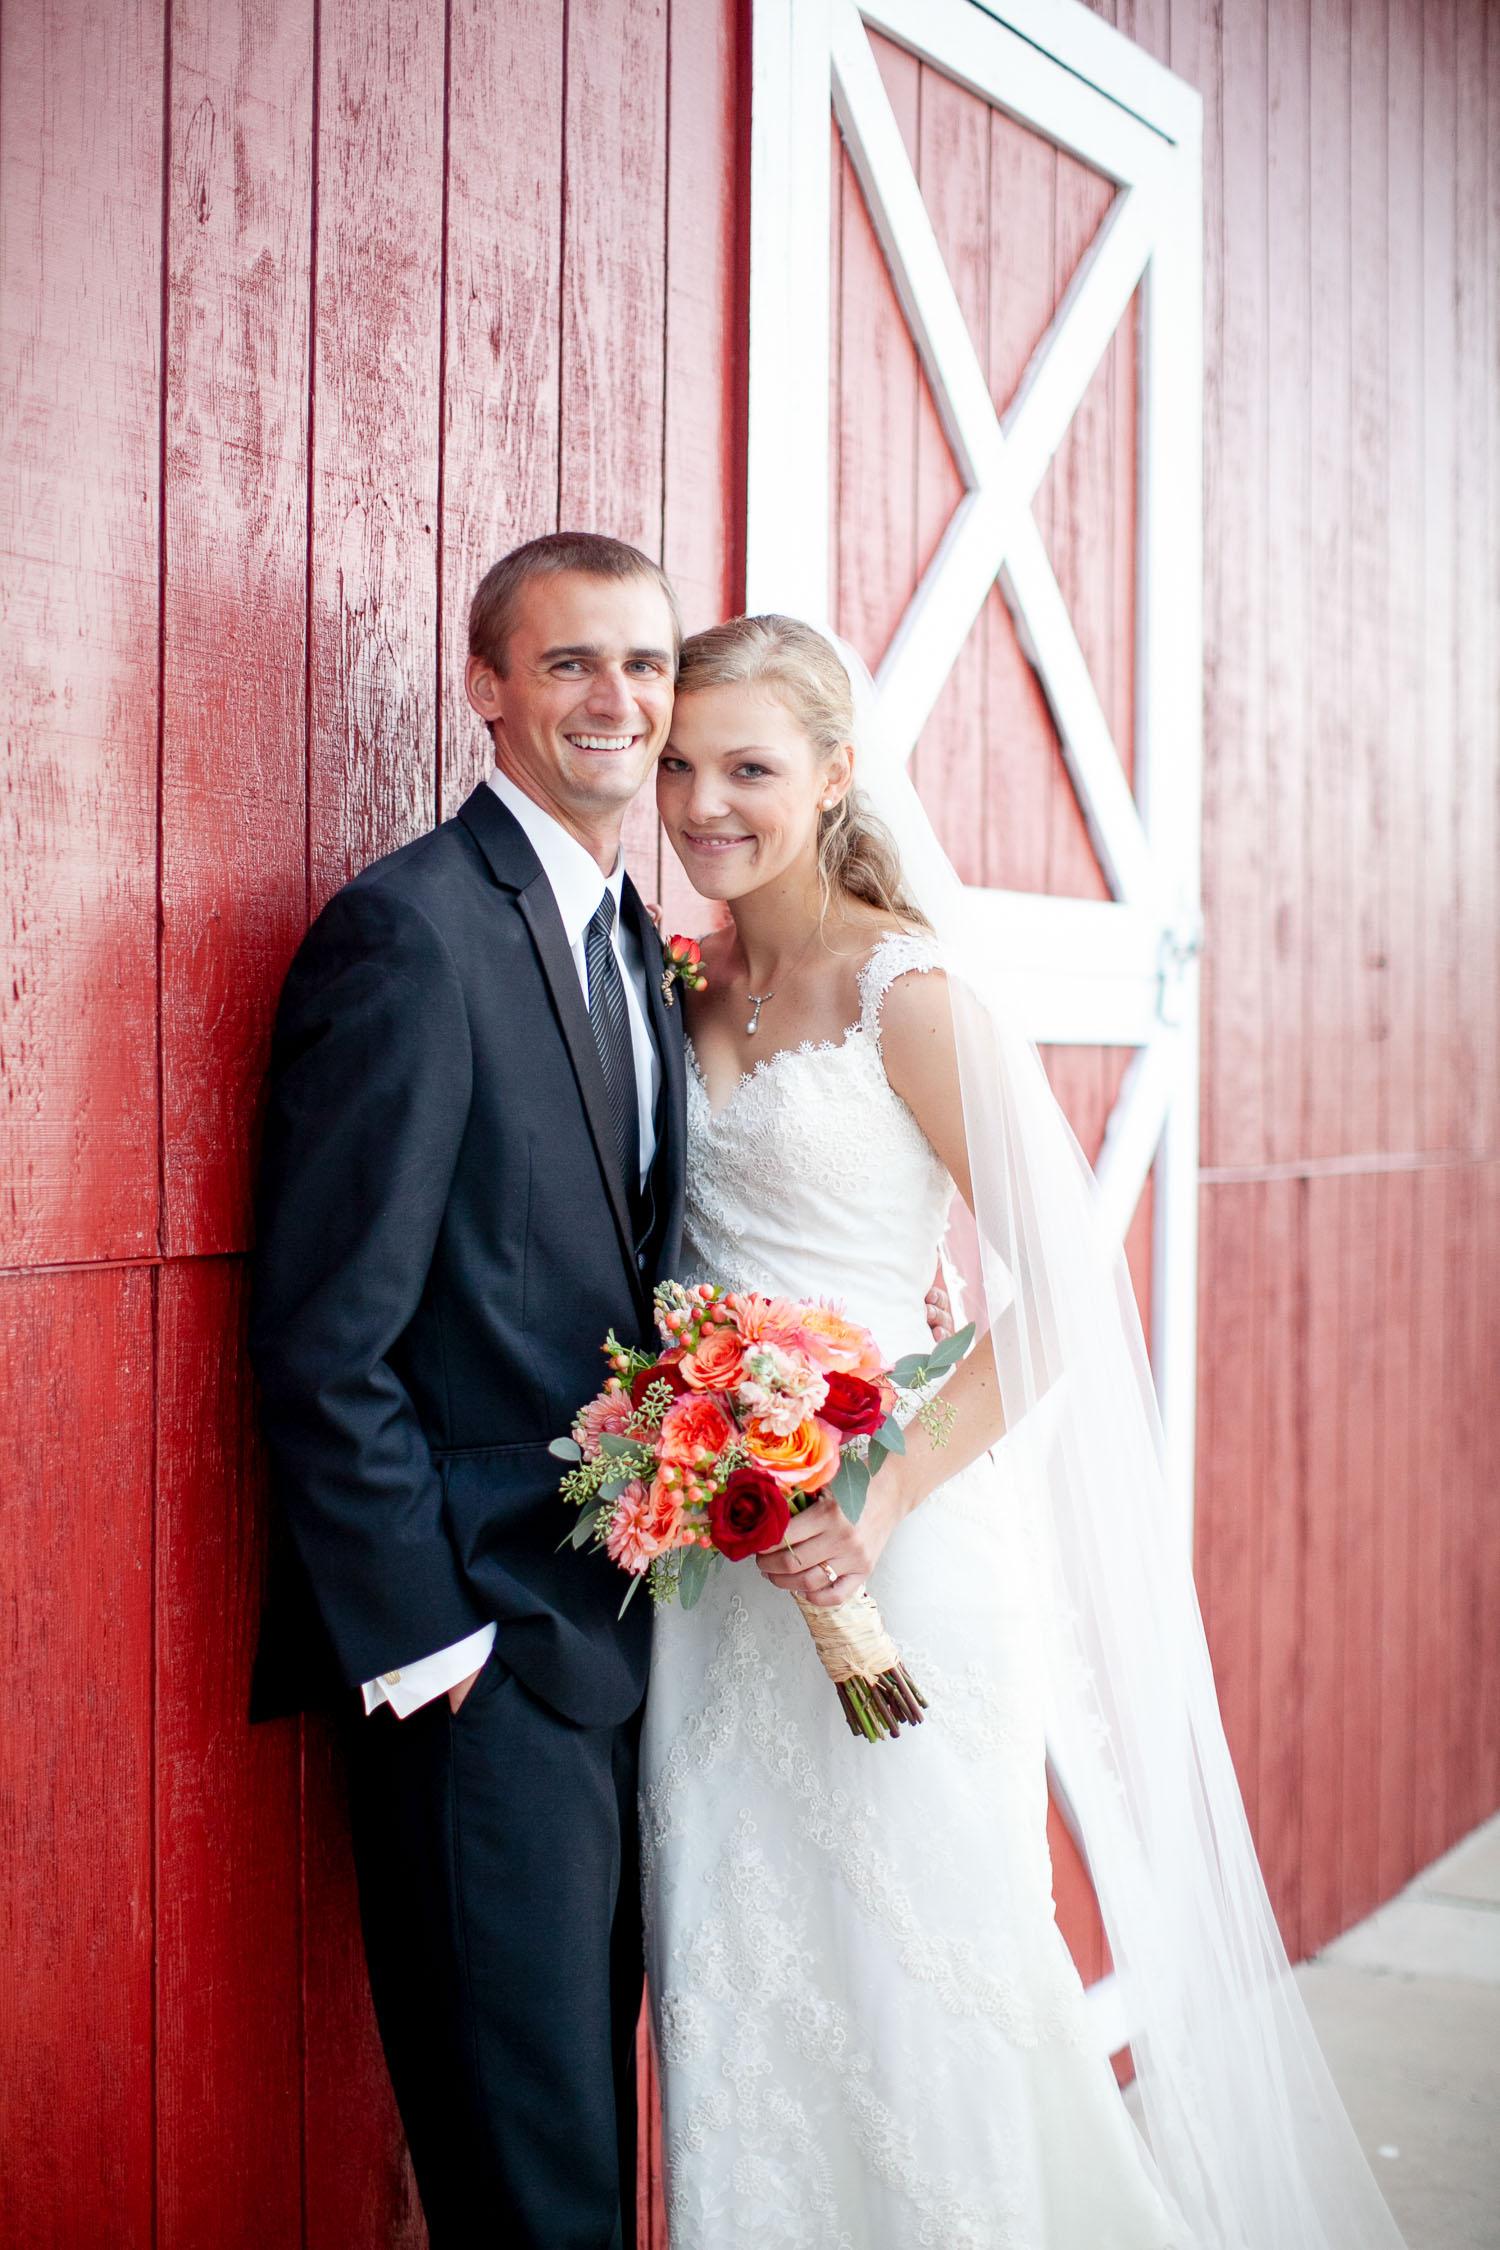 JMPHOTOART-Wedding-Photographer-171.jpg